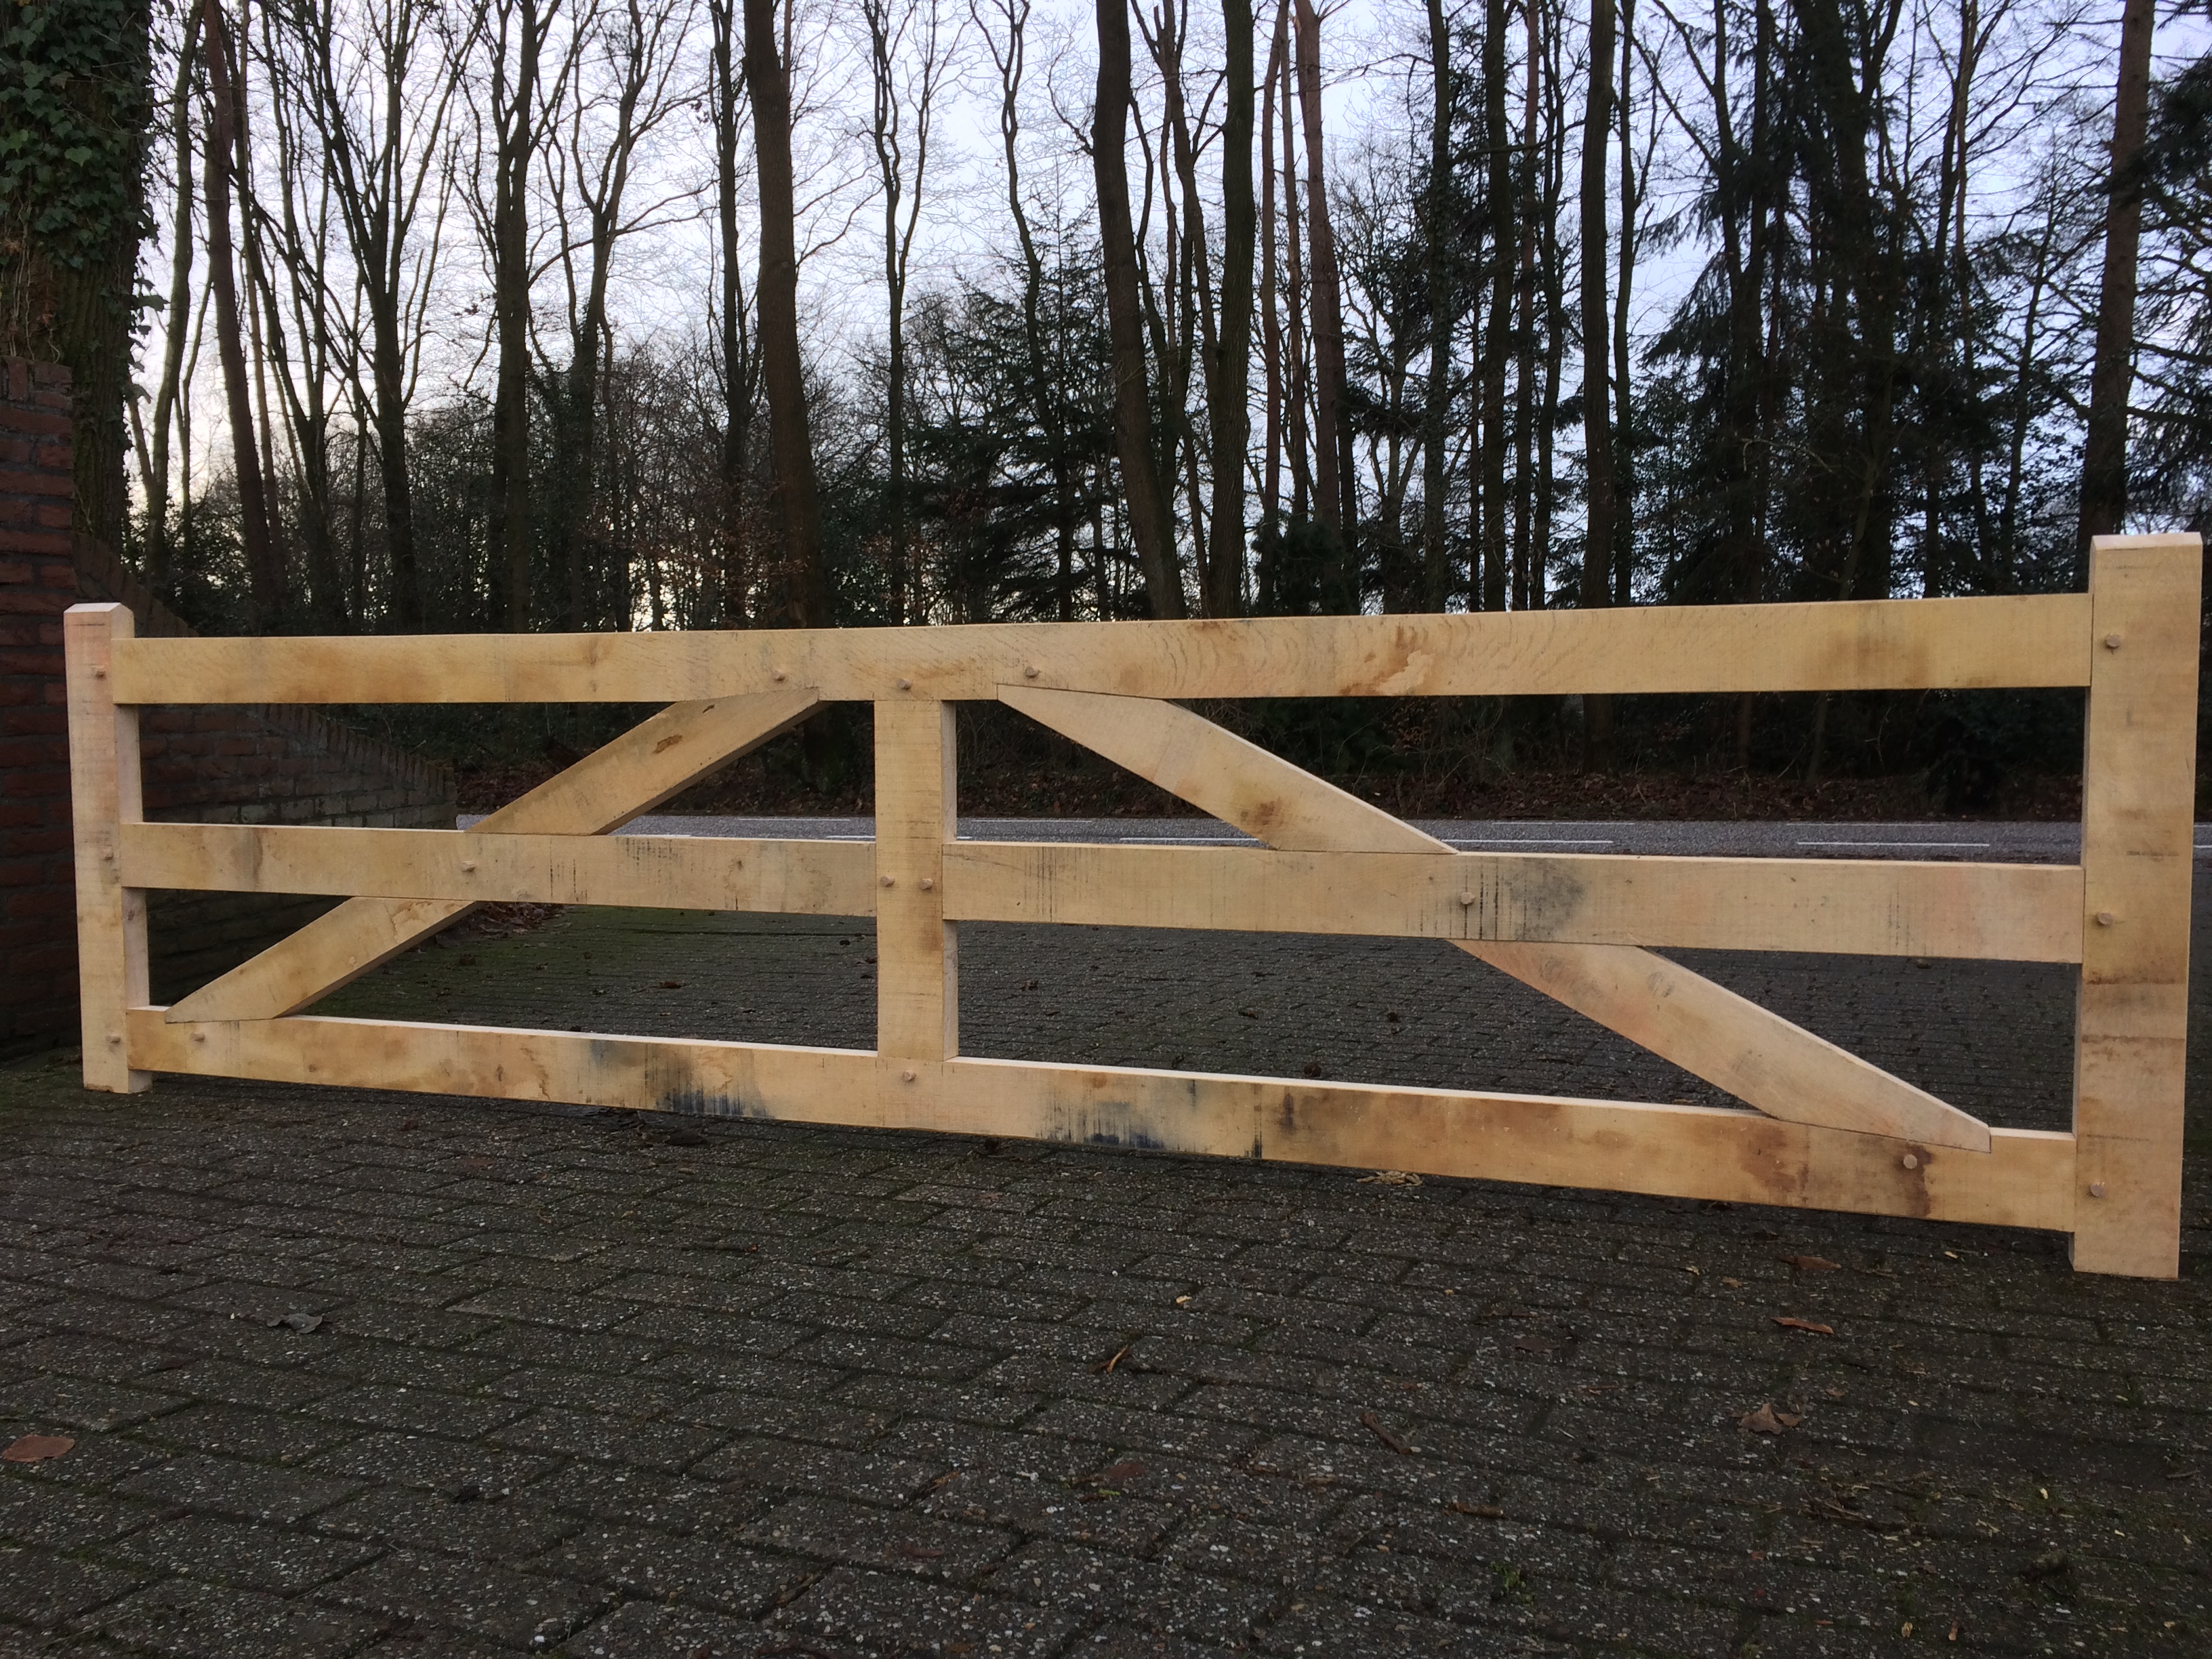 Houthandel Ensink hekken en poorten